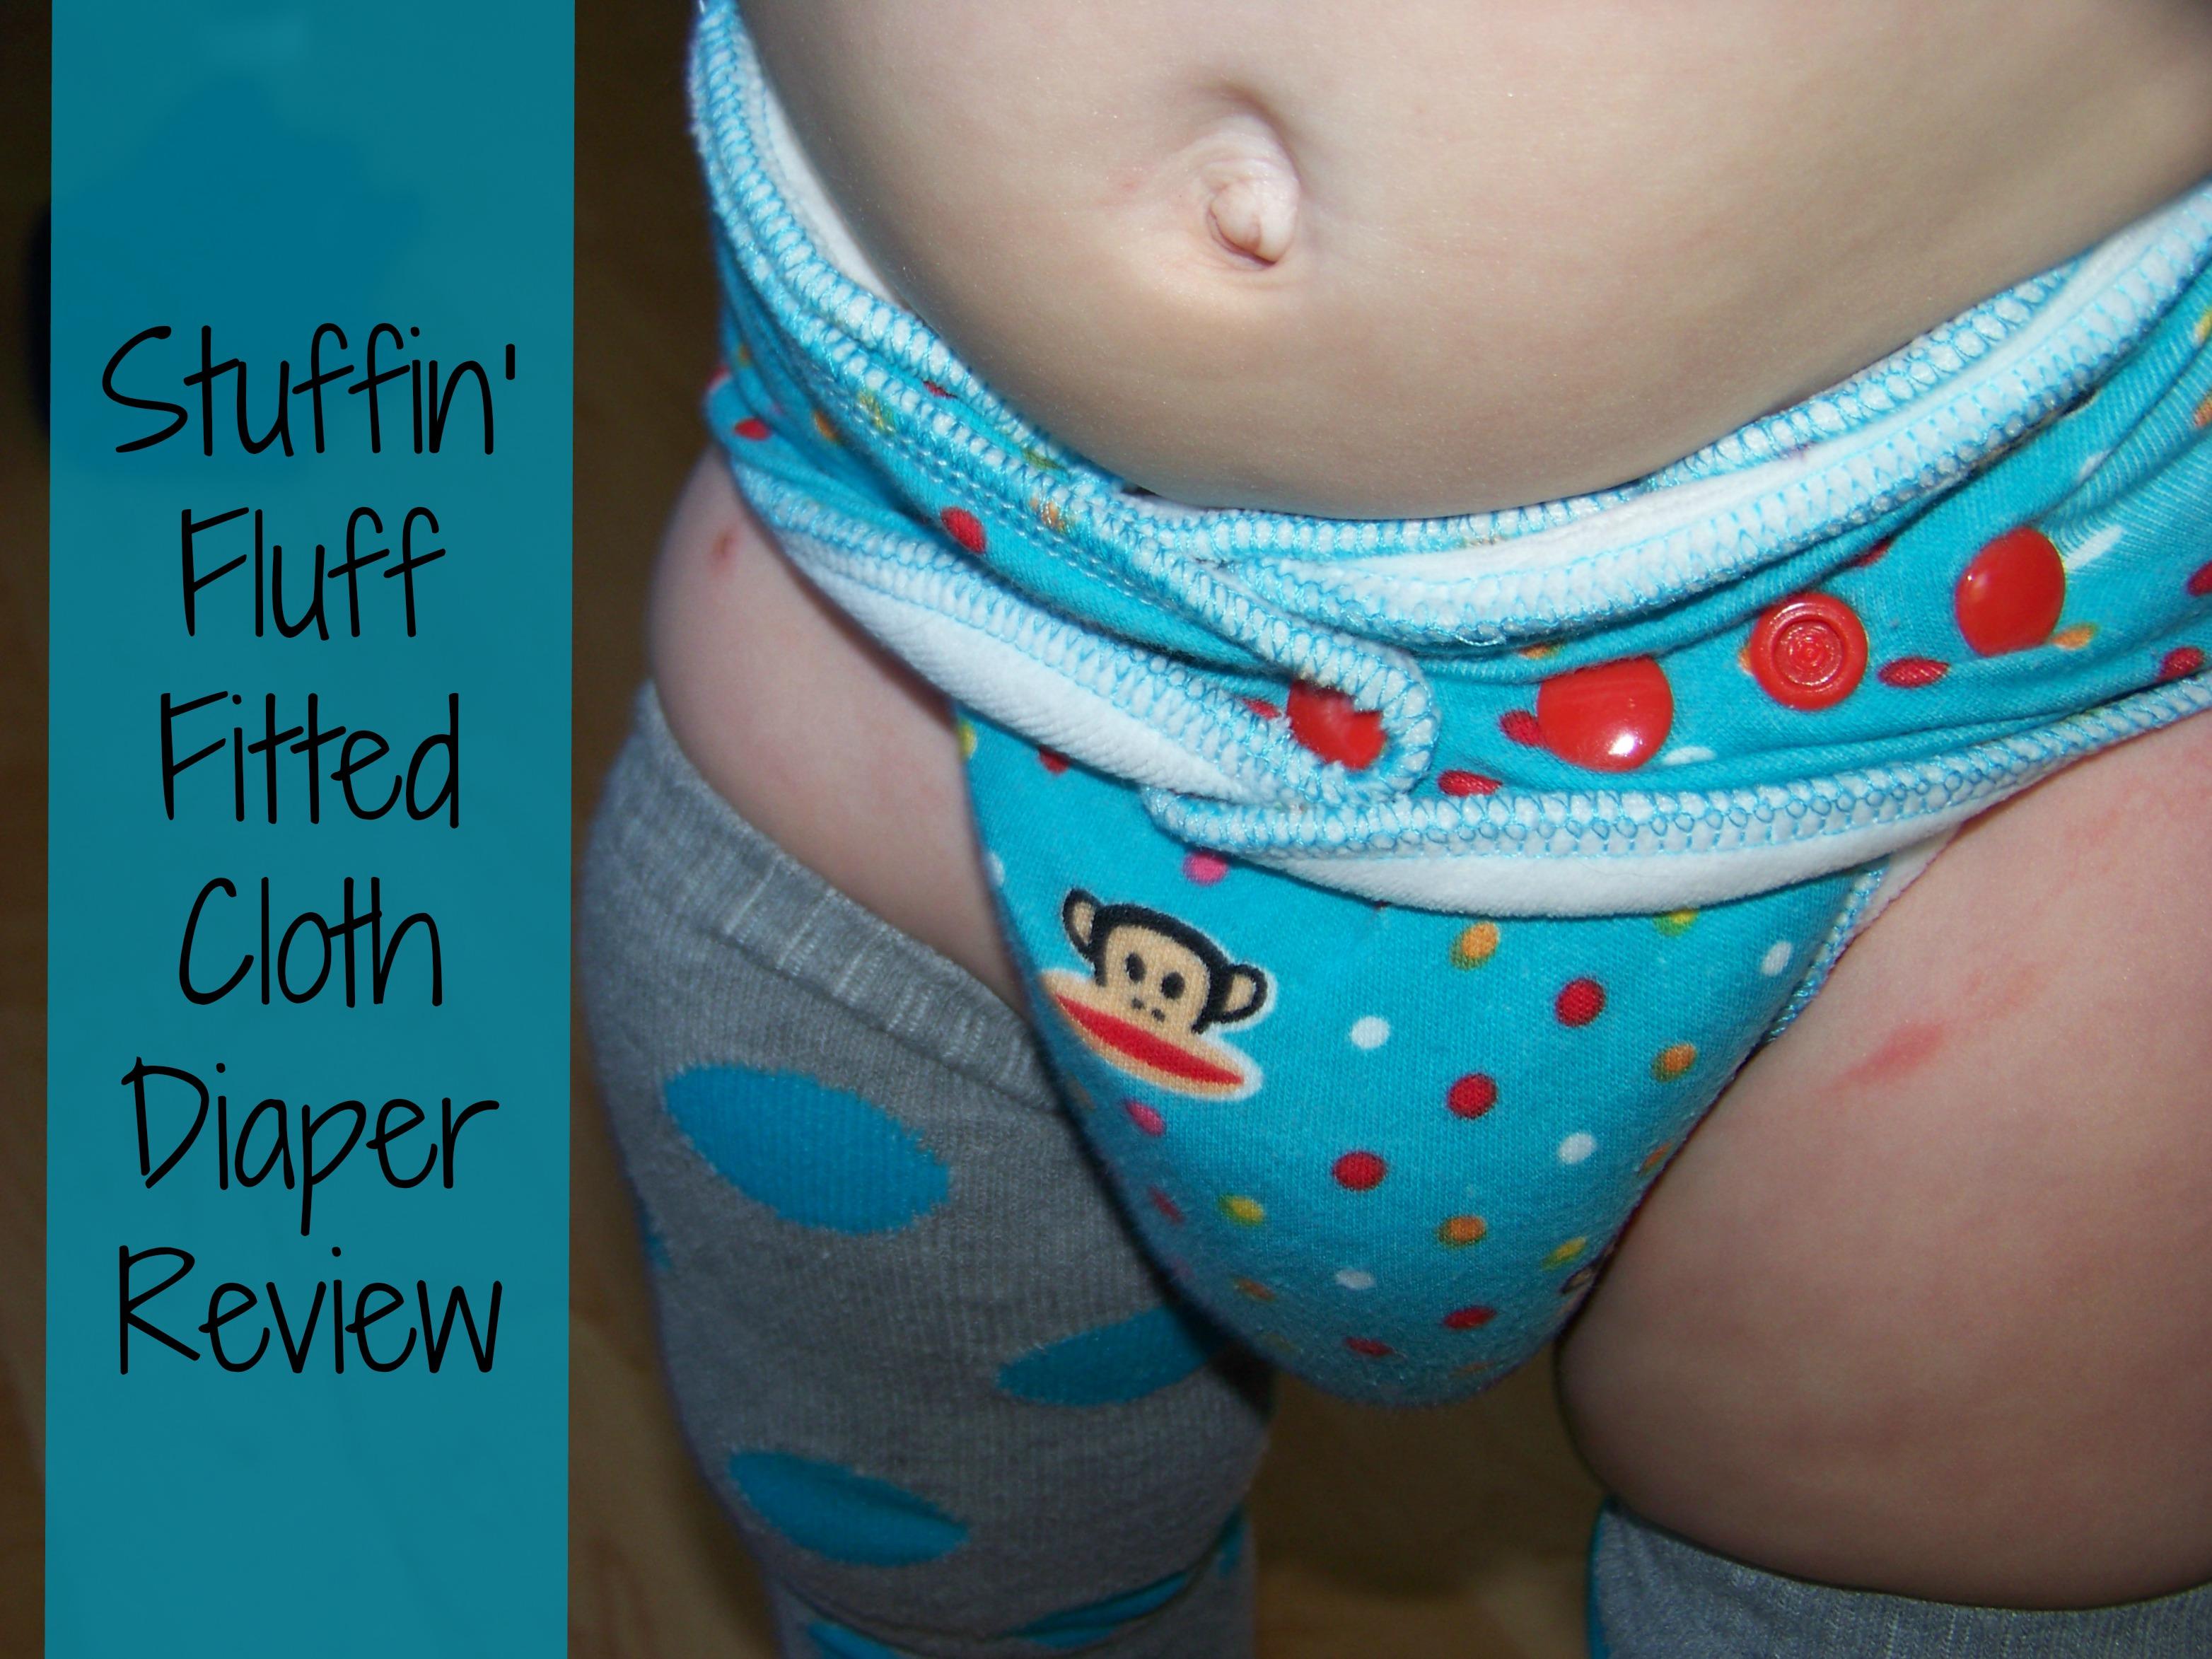 Stuffin' Fluff fitted cloth diaper